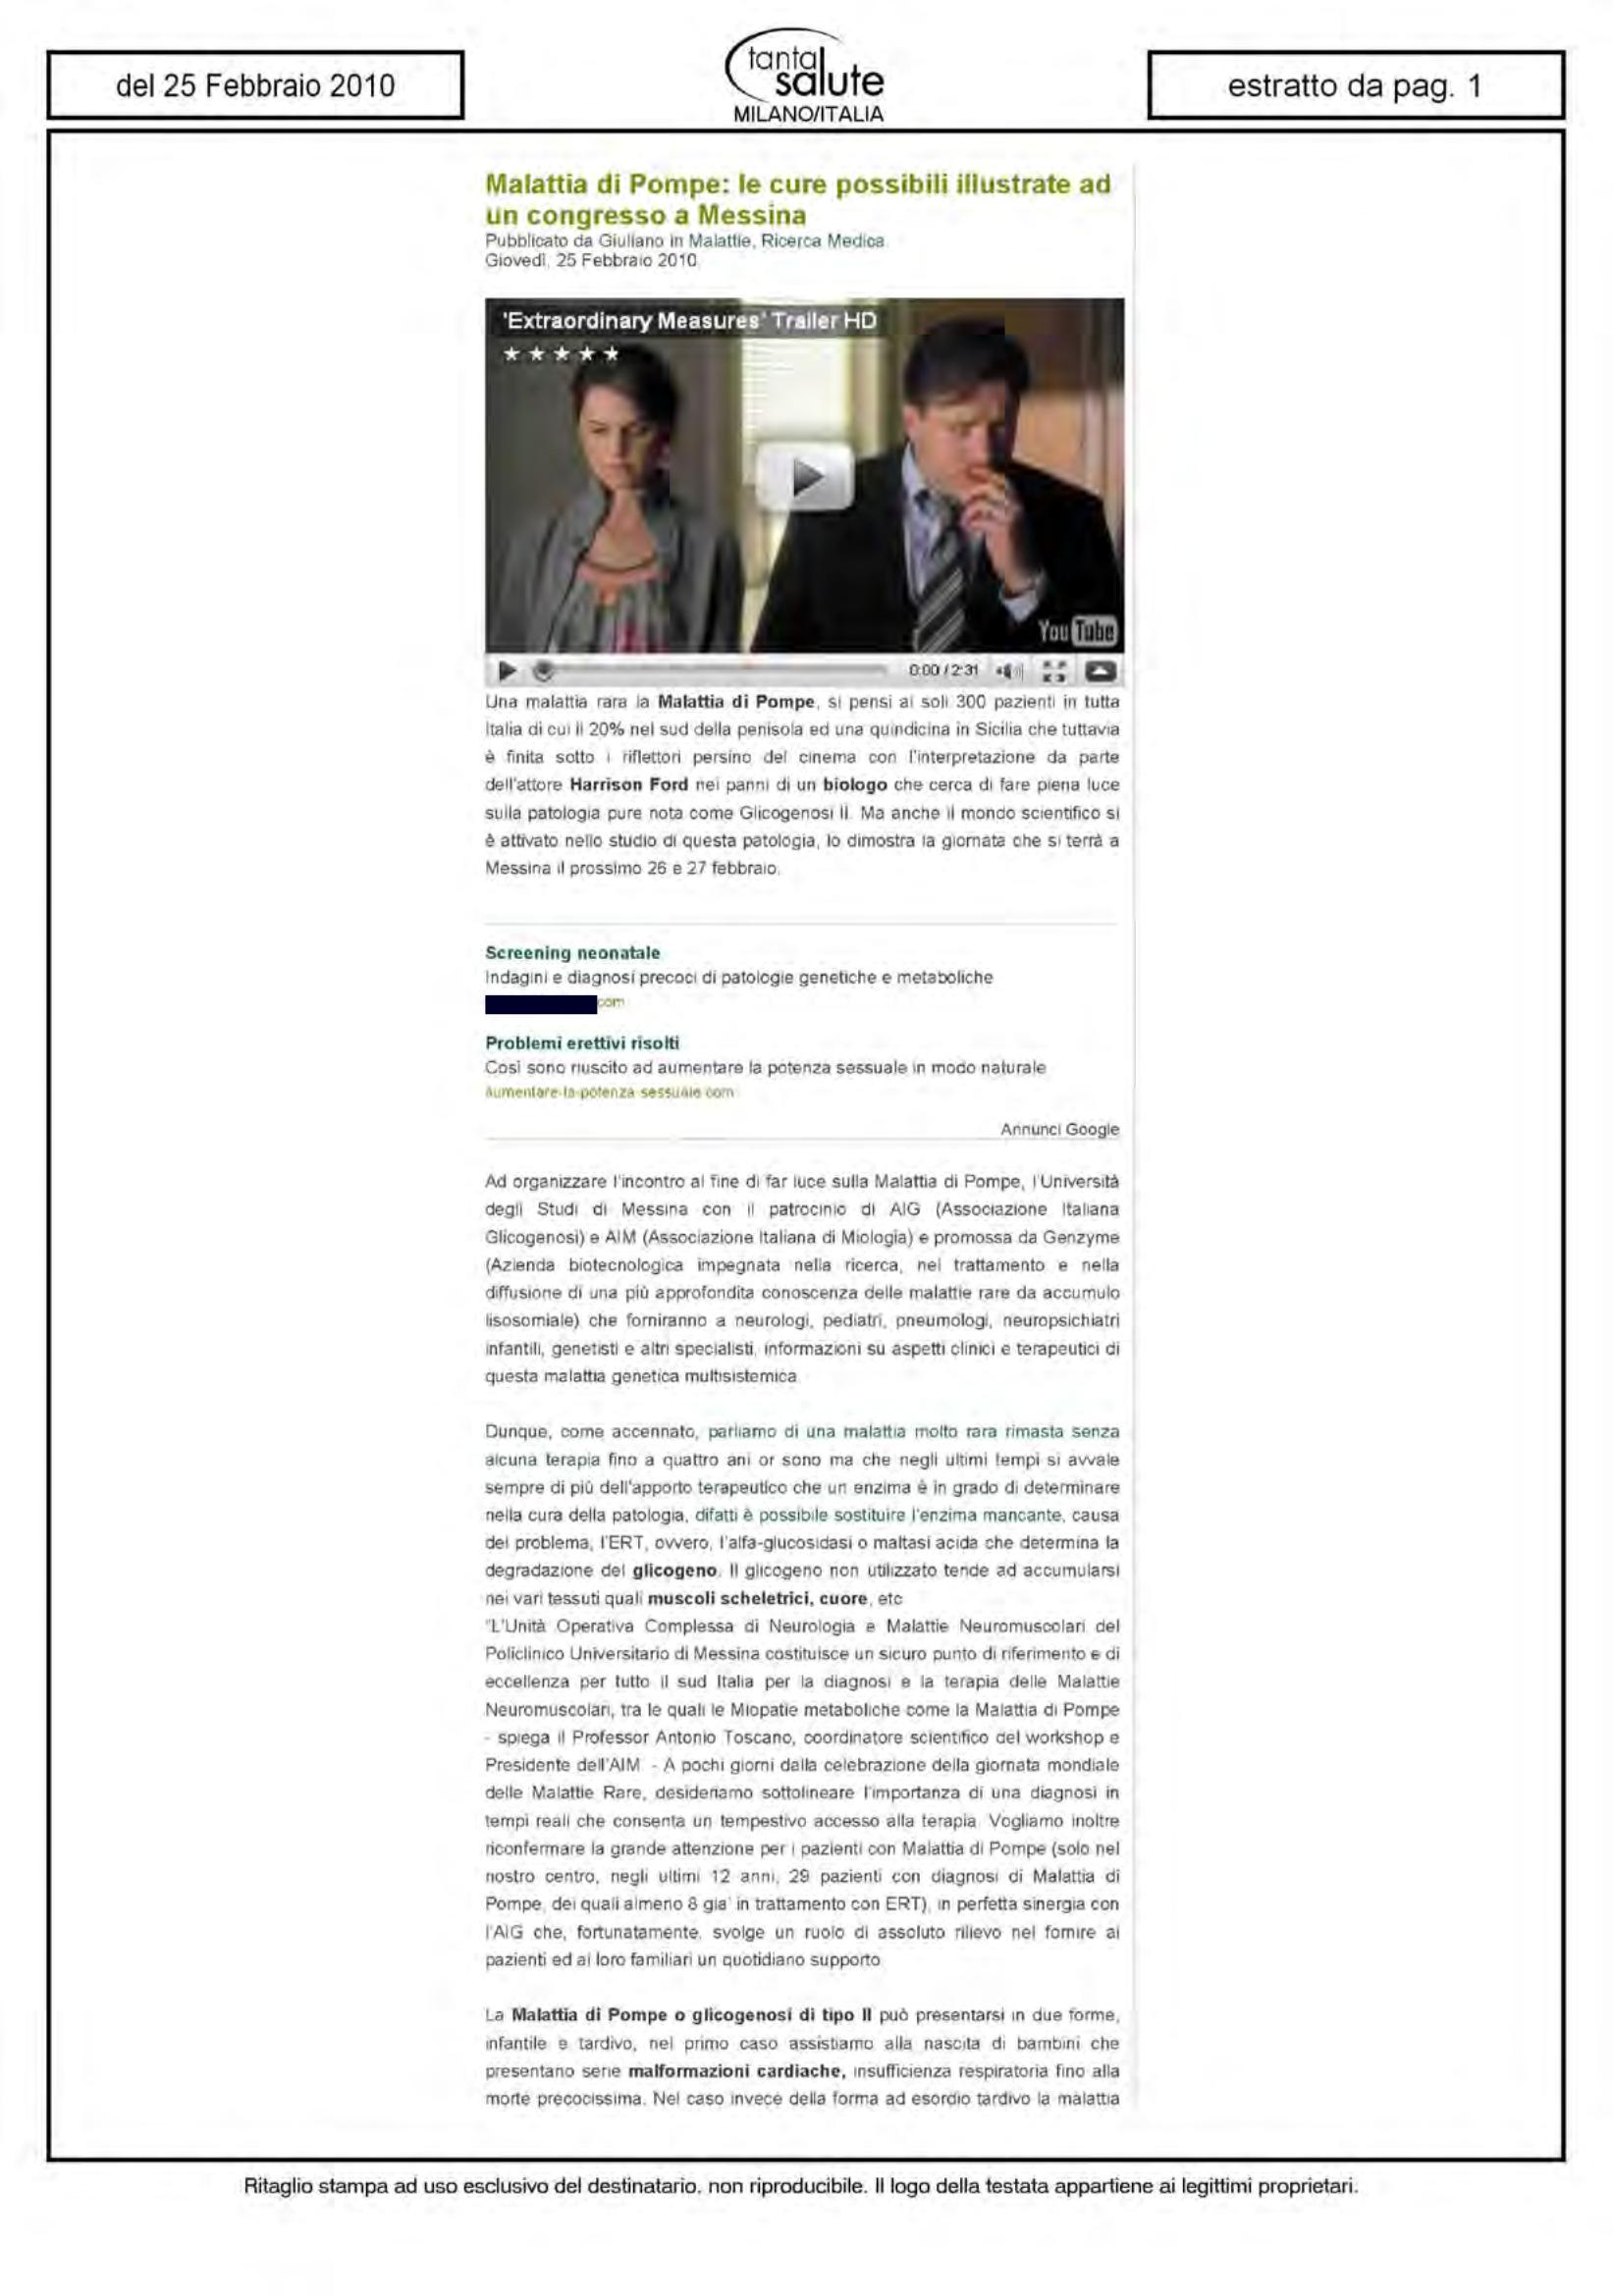 Stampa_20100422_misure straordinarie_Page_91